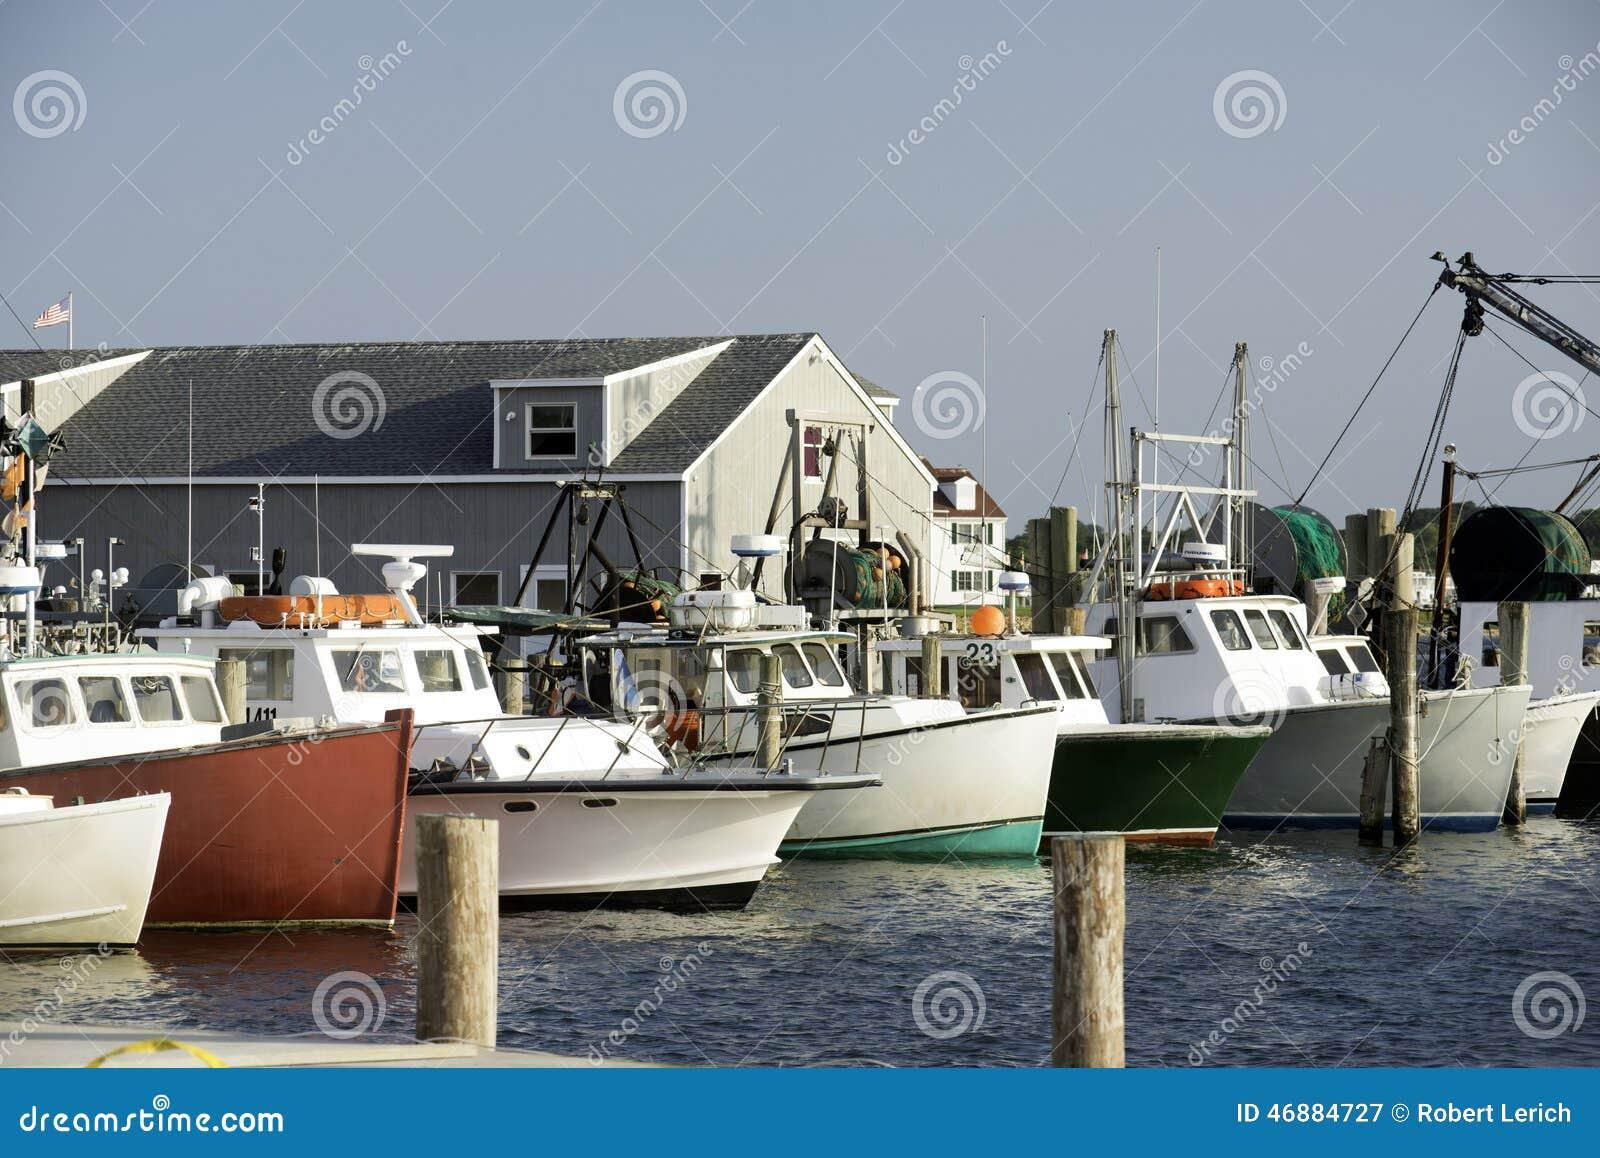 Fishing boats in bay harbor marina montauk new york usa for Nys fishing license prices